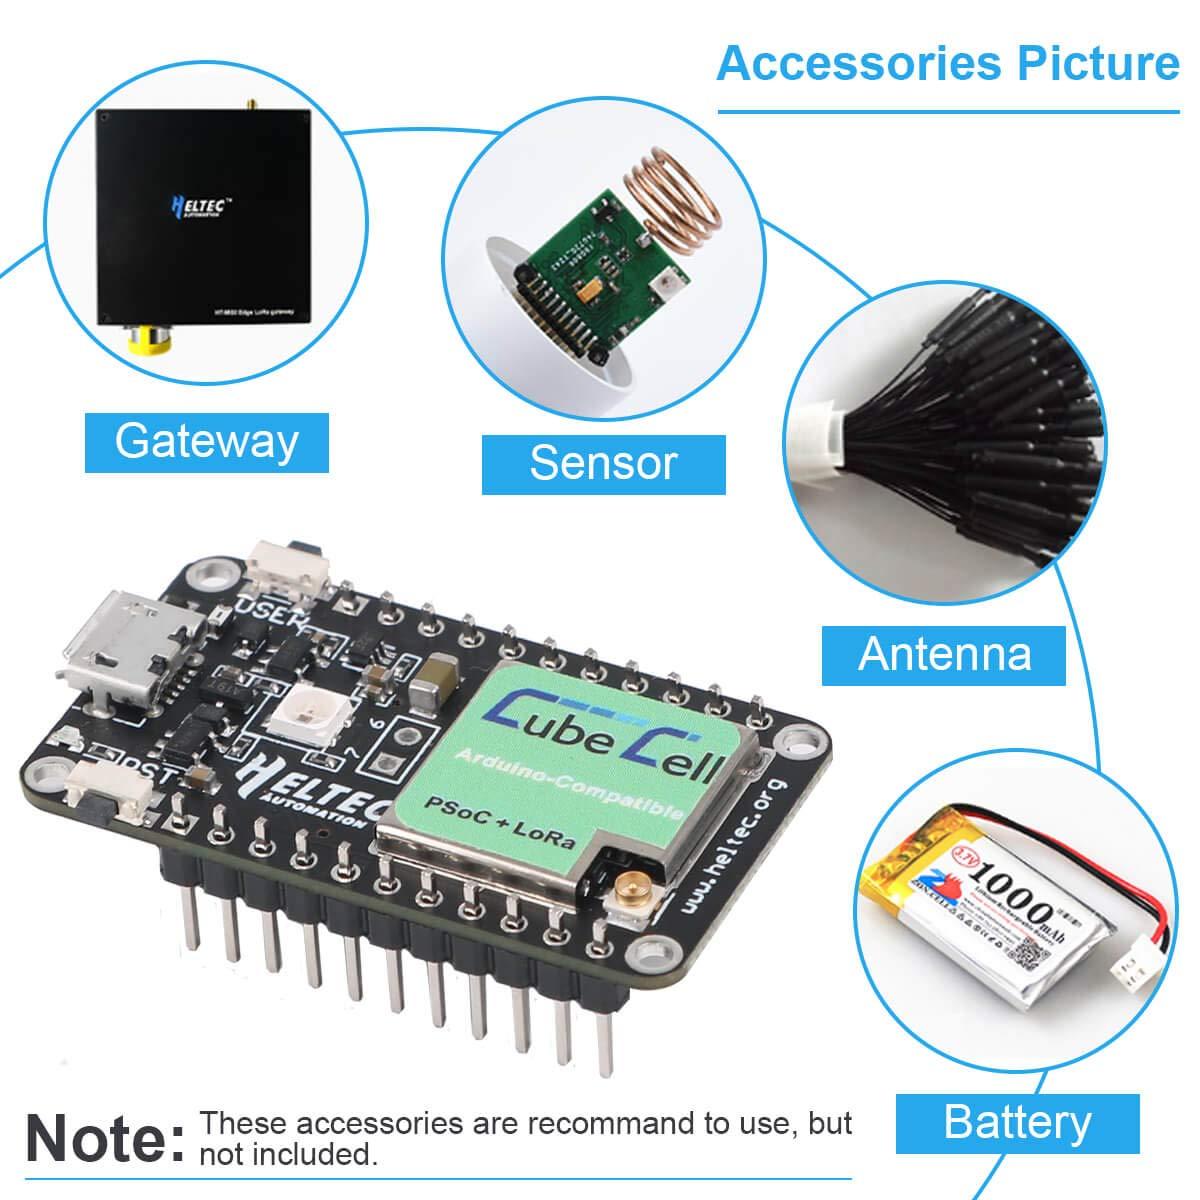 SX1262 Lora Module 868 915 MHZ LoRaWAN IoT Development Board ASR6501 MCU 128KB Flash Ultra Low Power Consumption Solar Energy Powered Design with Antenna for Arduino and Intelligent Scene